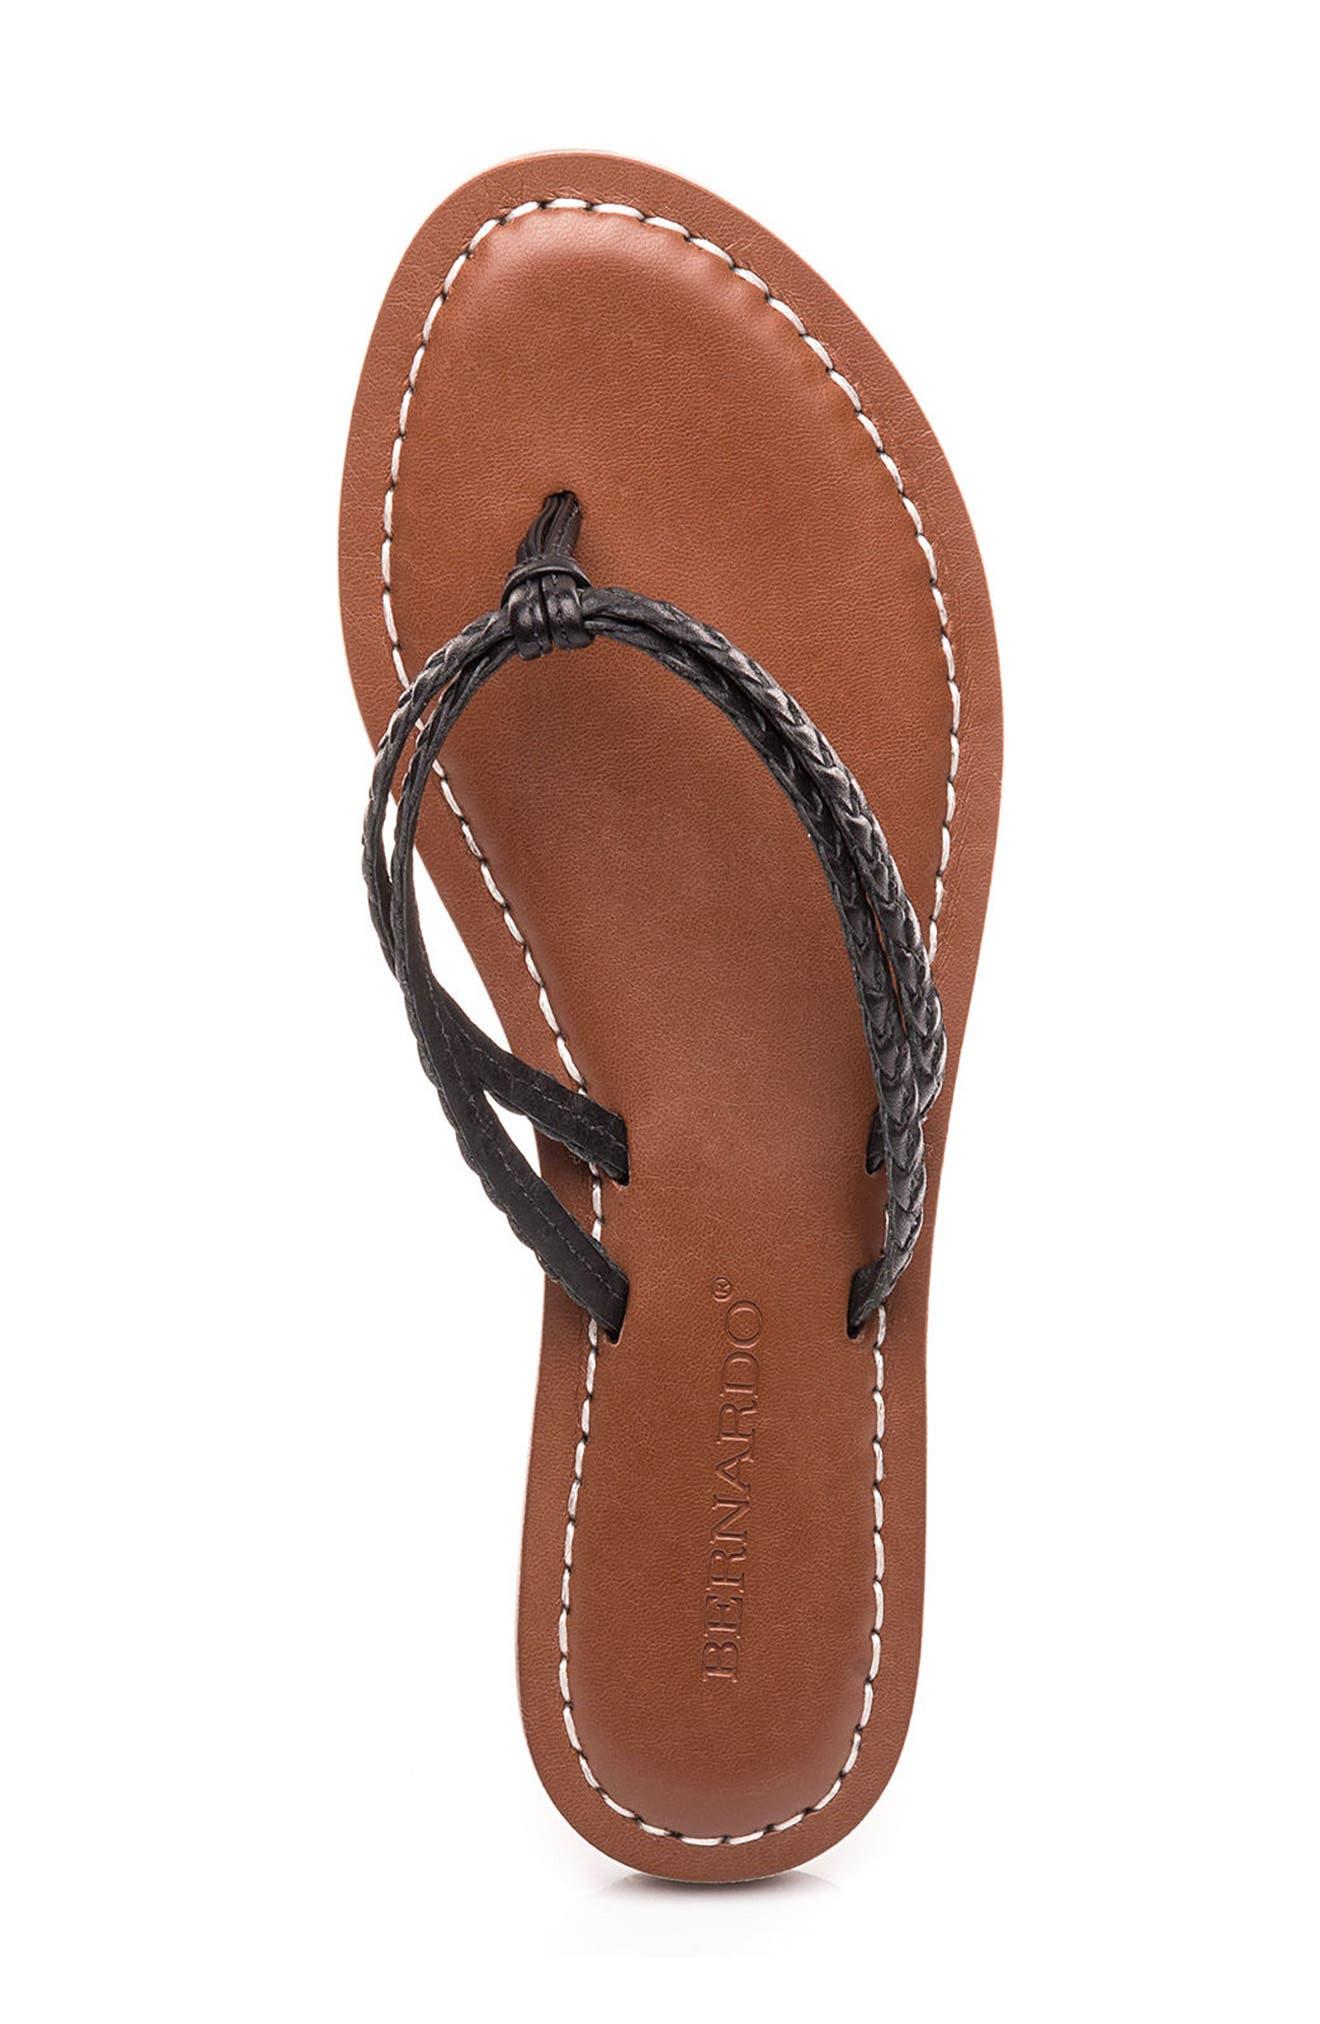 Bernardo Greta Braided Strap Sandal,                             Alternate thumbnail 5, color,                             Black Leather